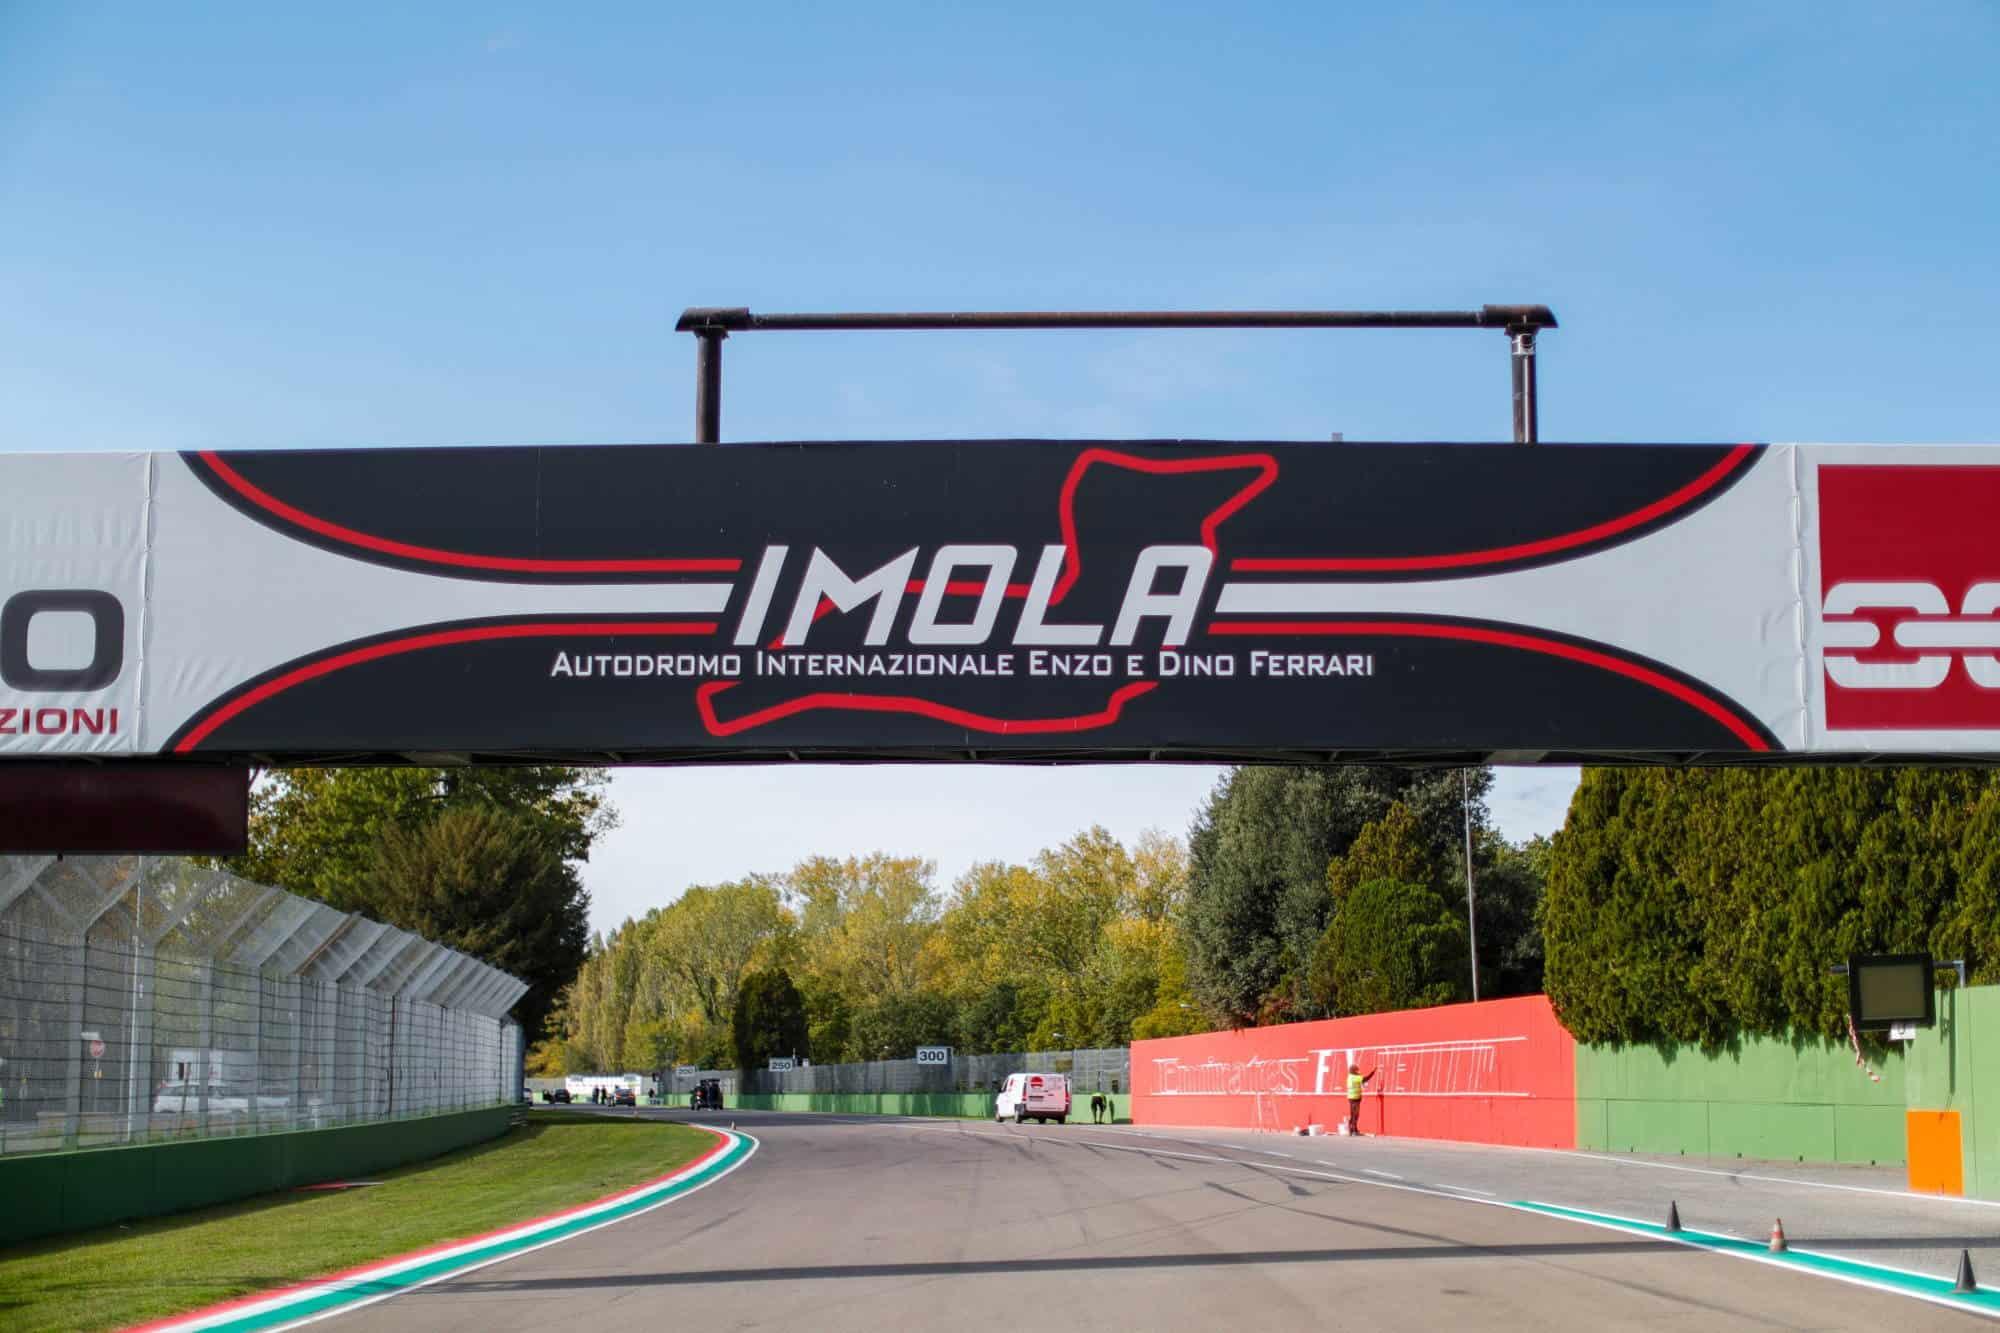 2020 Emilia Romagna Imola start finish line Photo McLaren